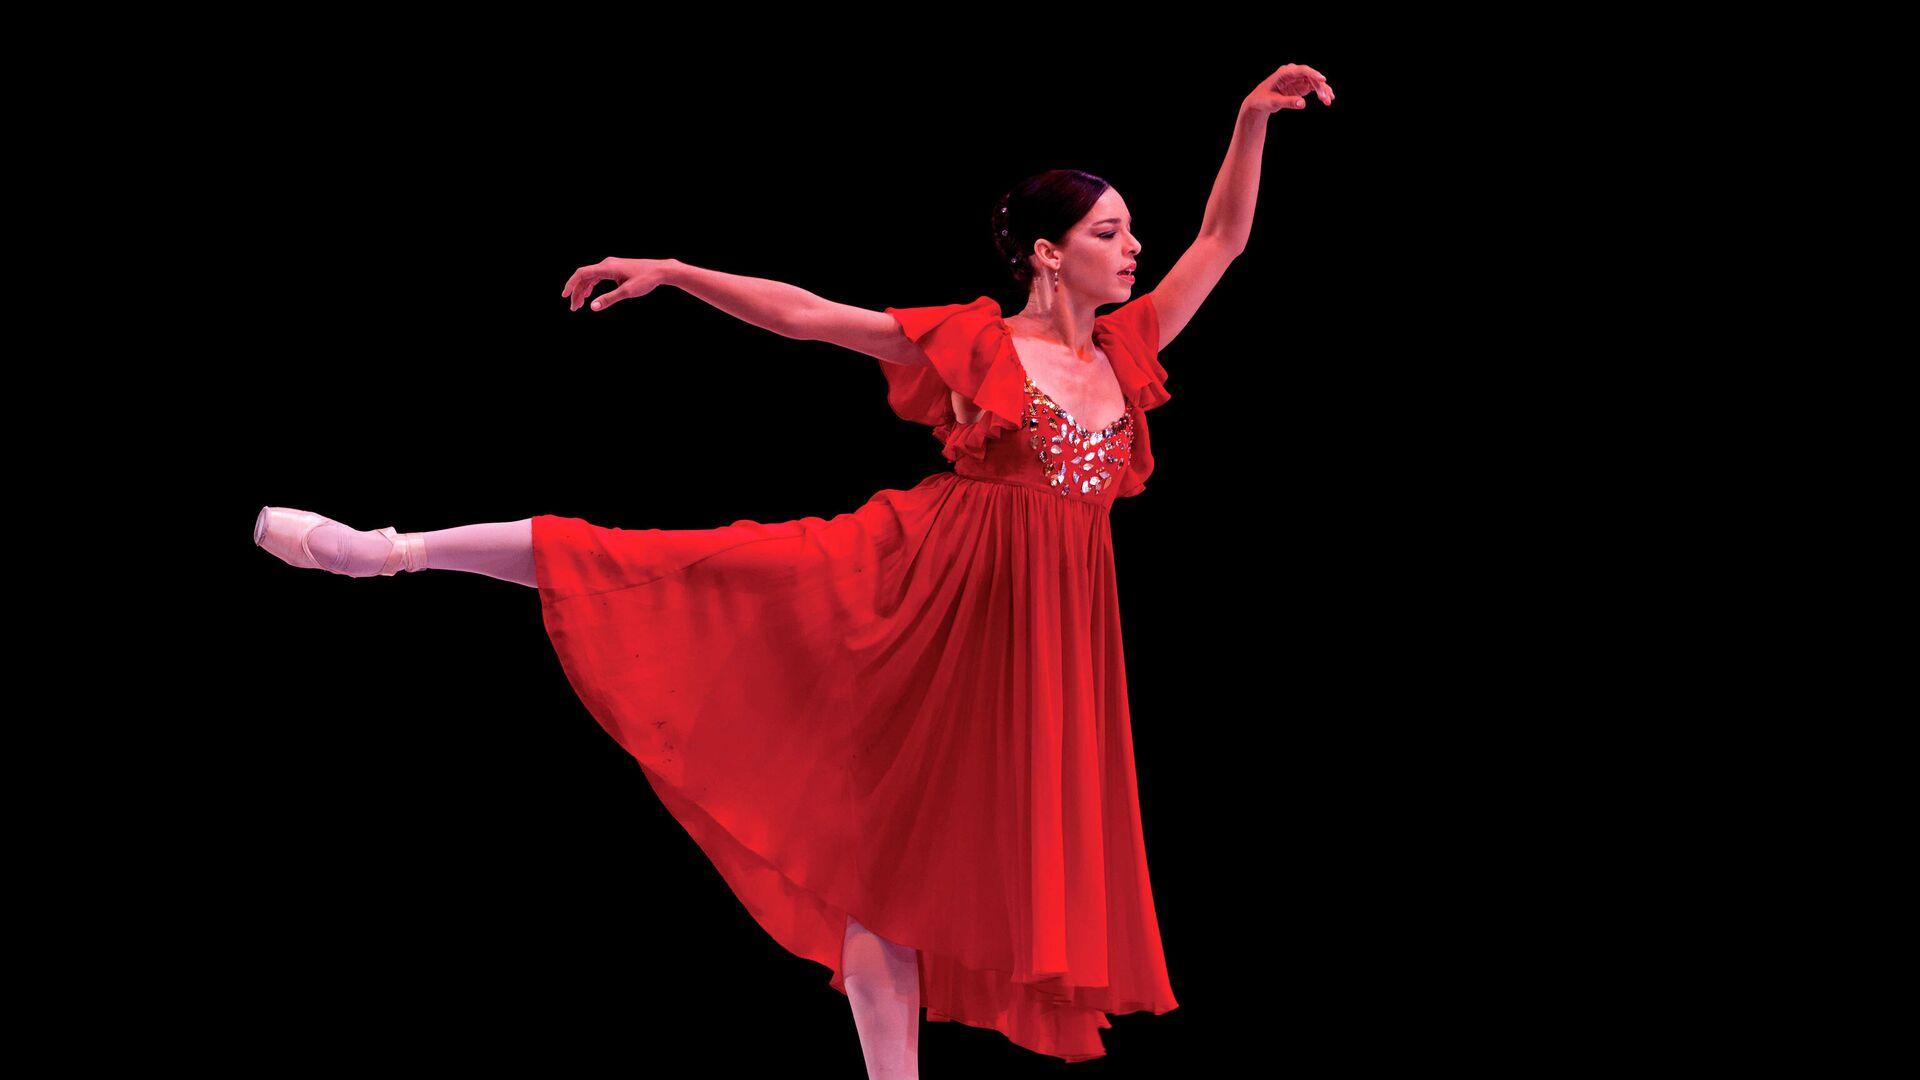 Bailarina en Cuba - Sputnik Mundo, 1920, 26.05.2021